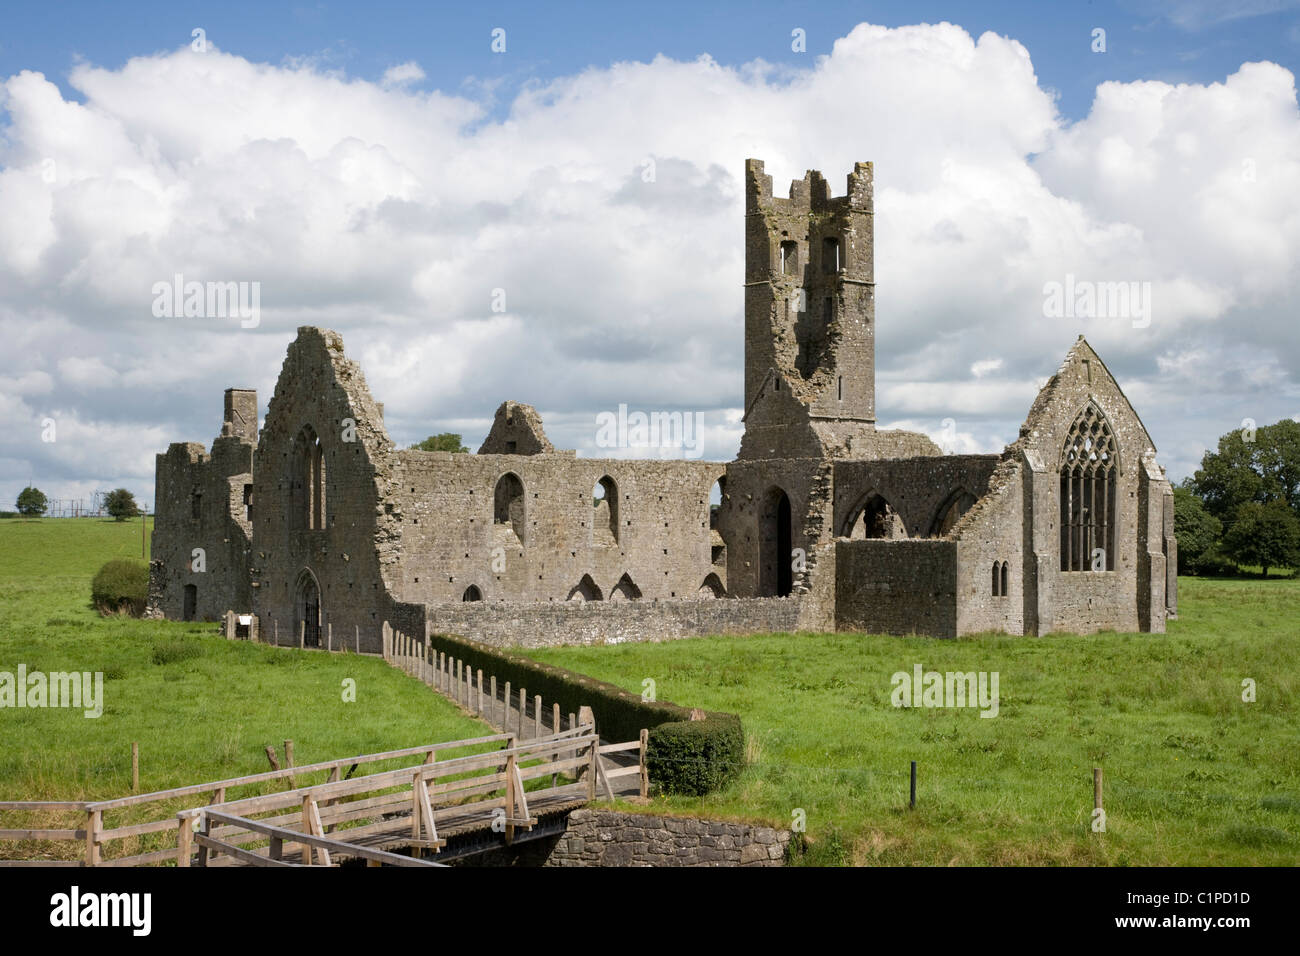 Republic of Ireland, County Limerick, Kilmallock Priory - Stock Image